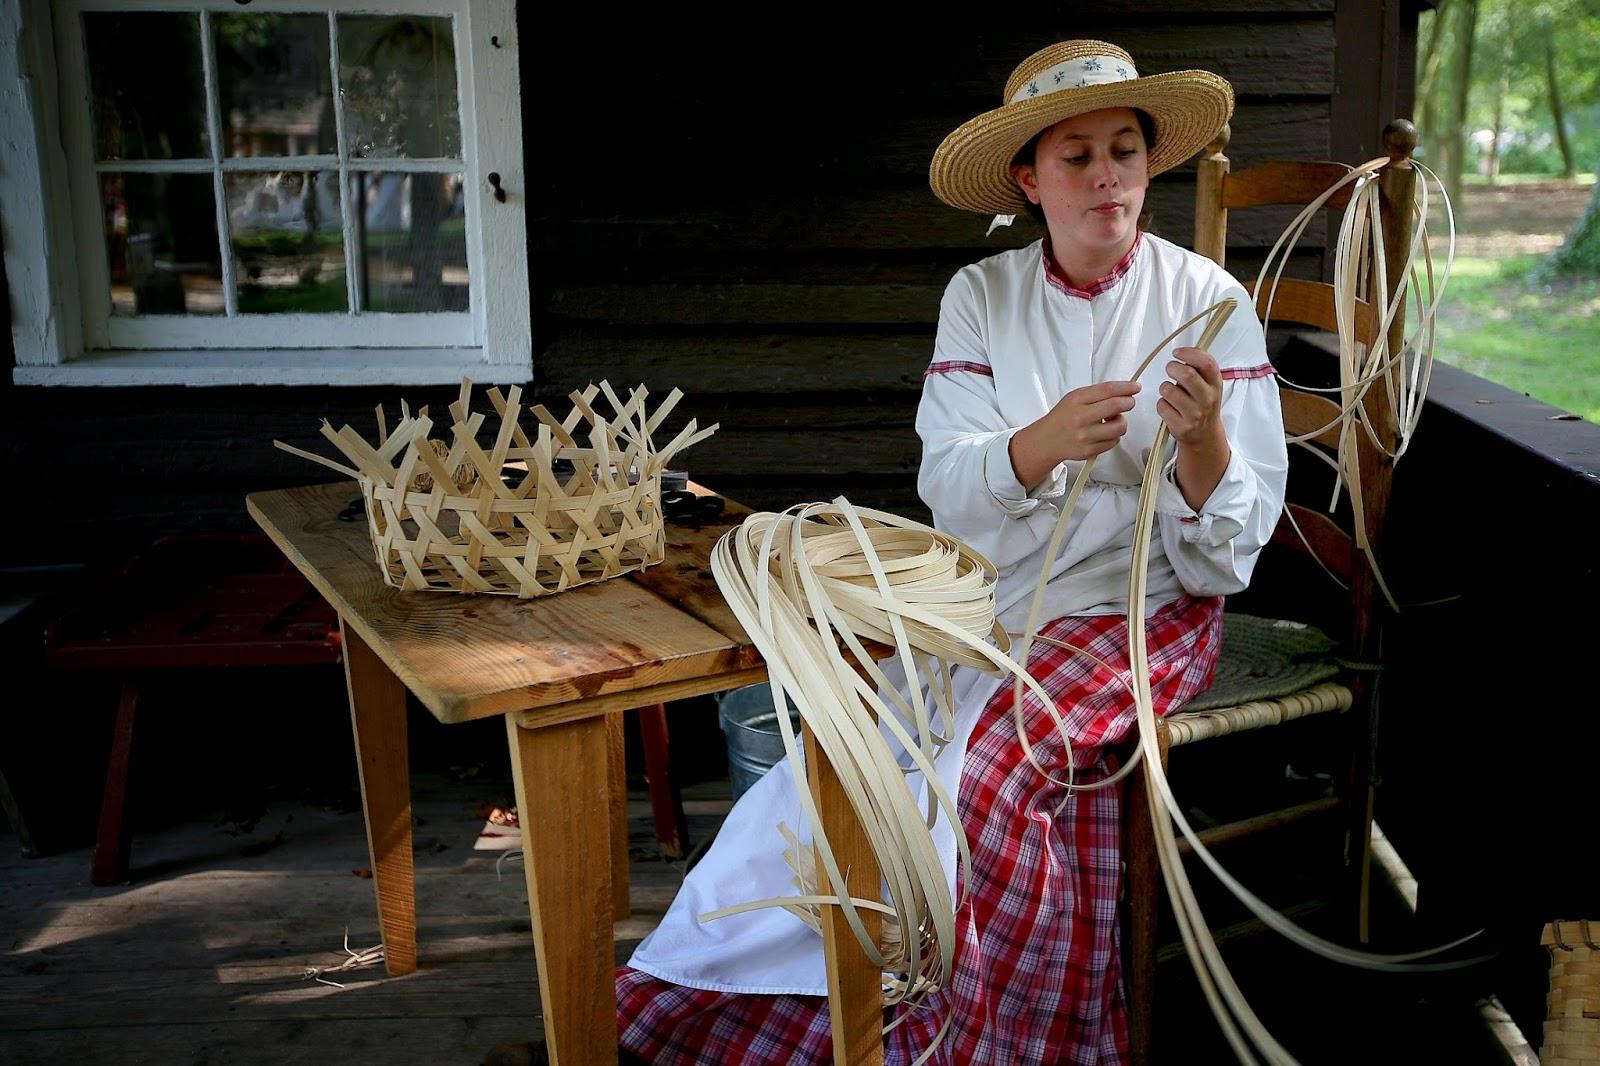 Traditional Basket Making : Palimpsest civil war reenactment